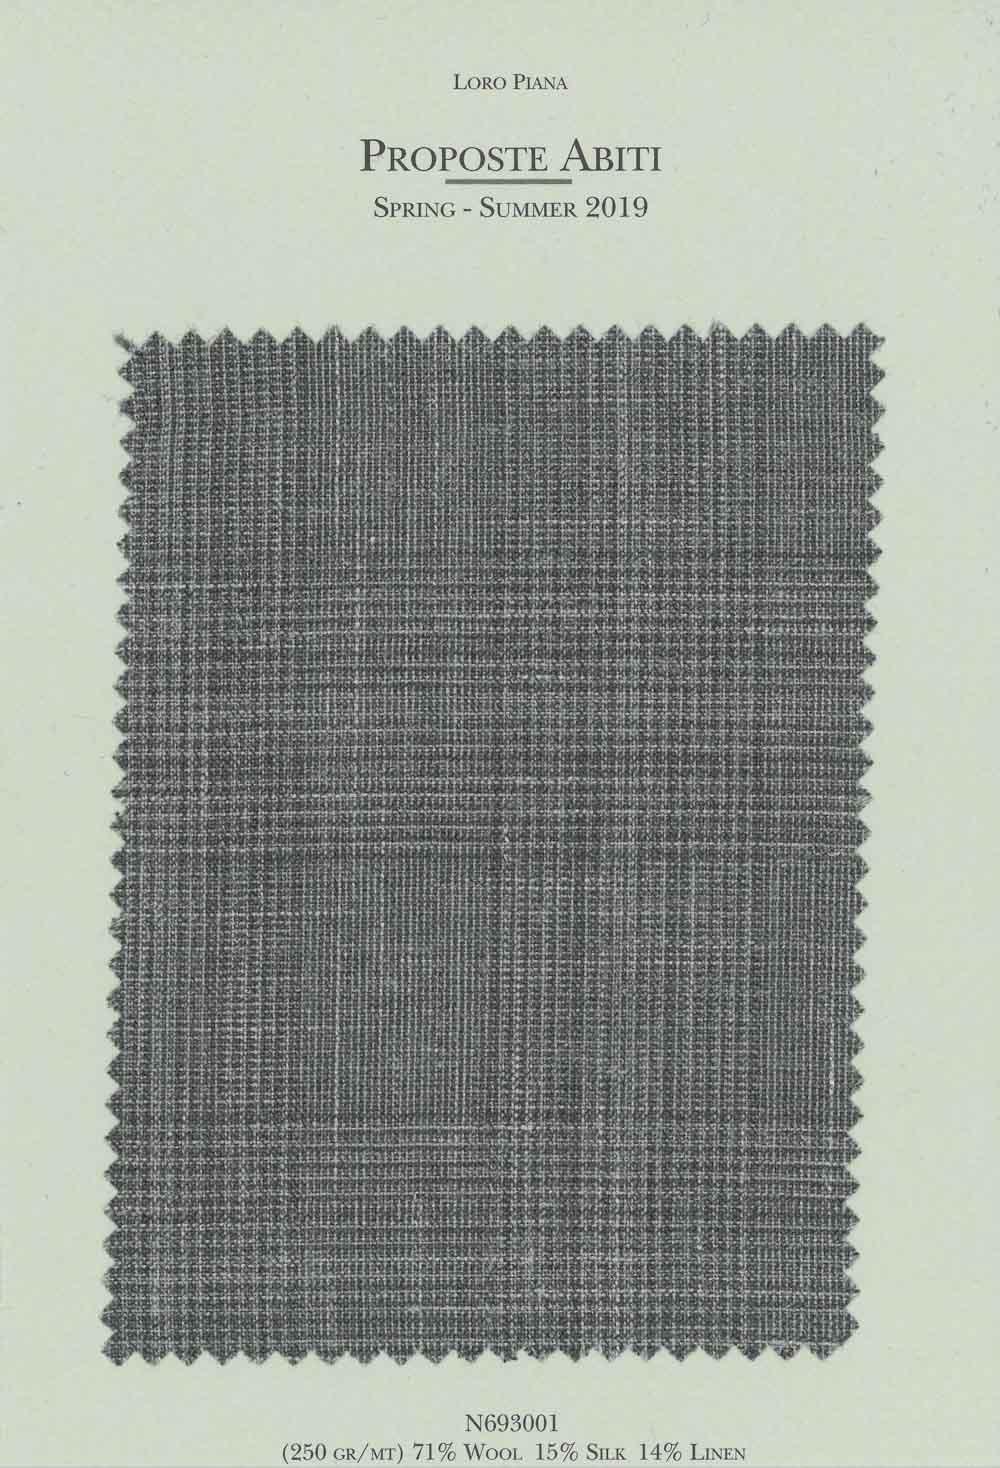 N693001